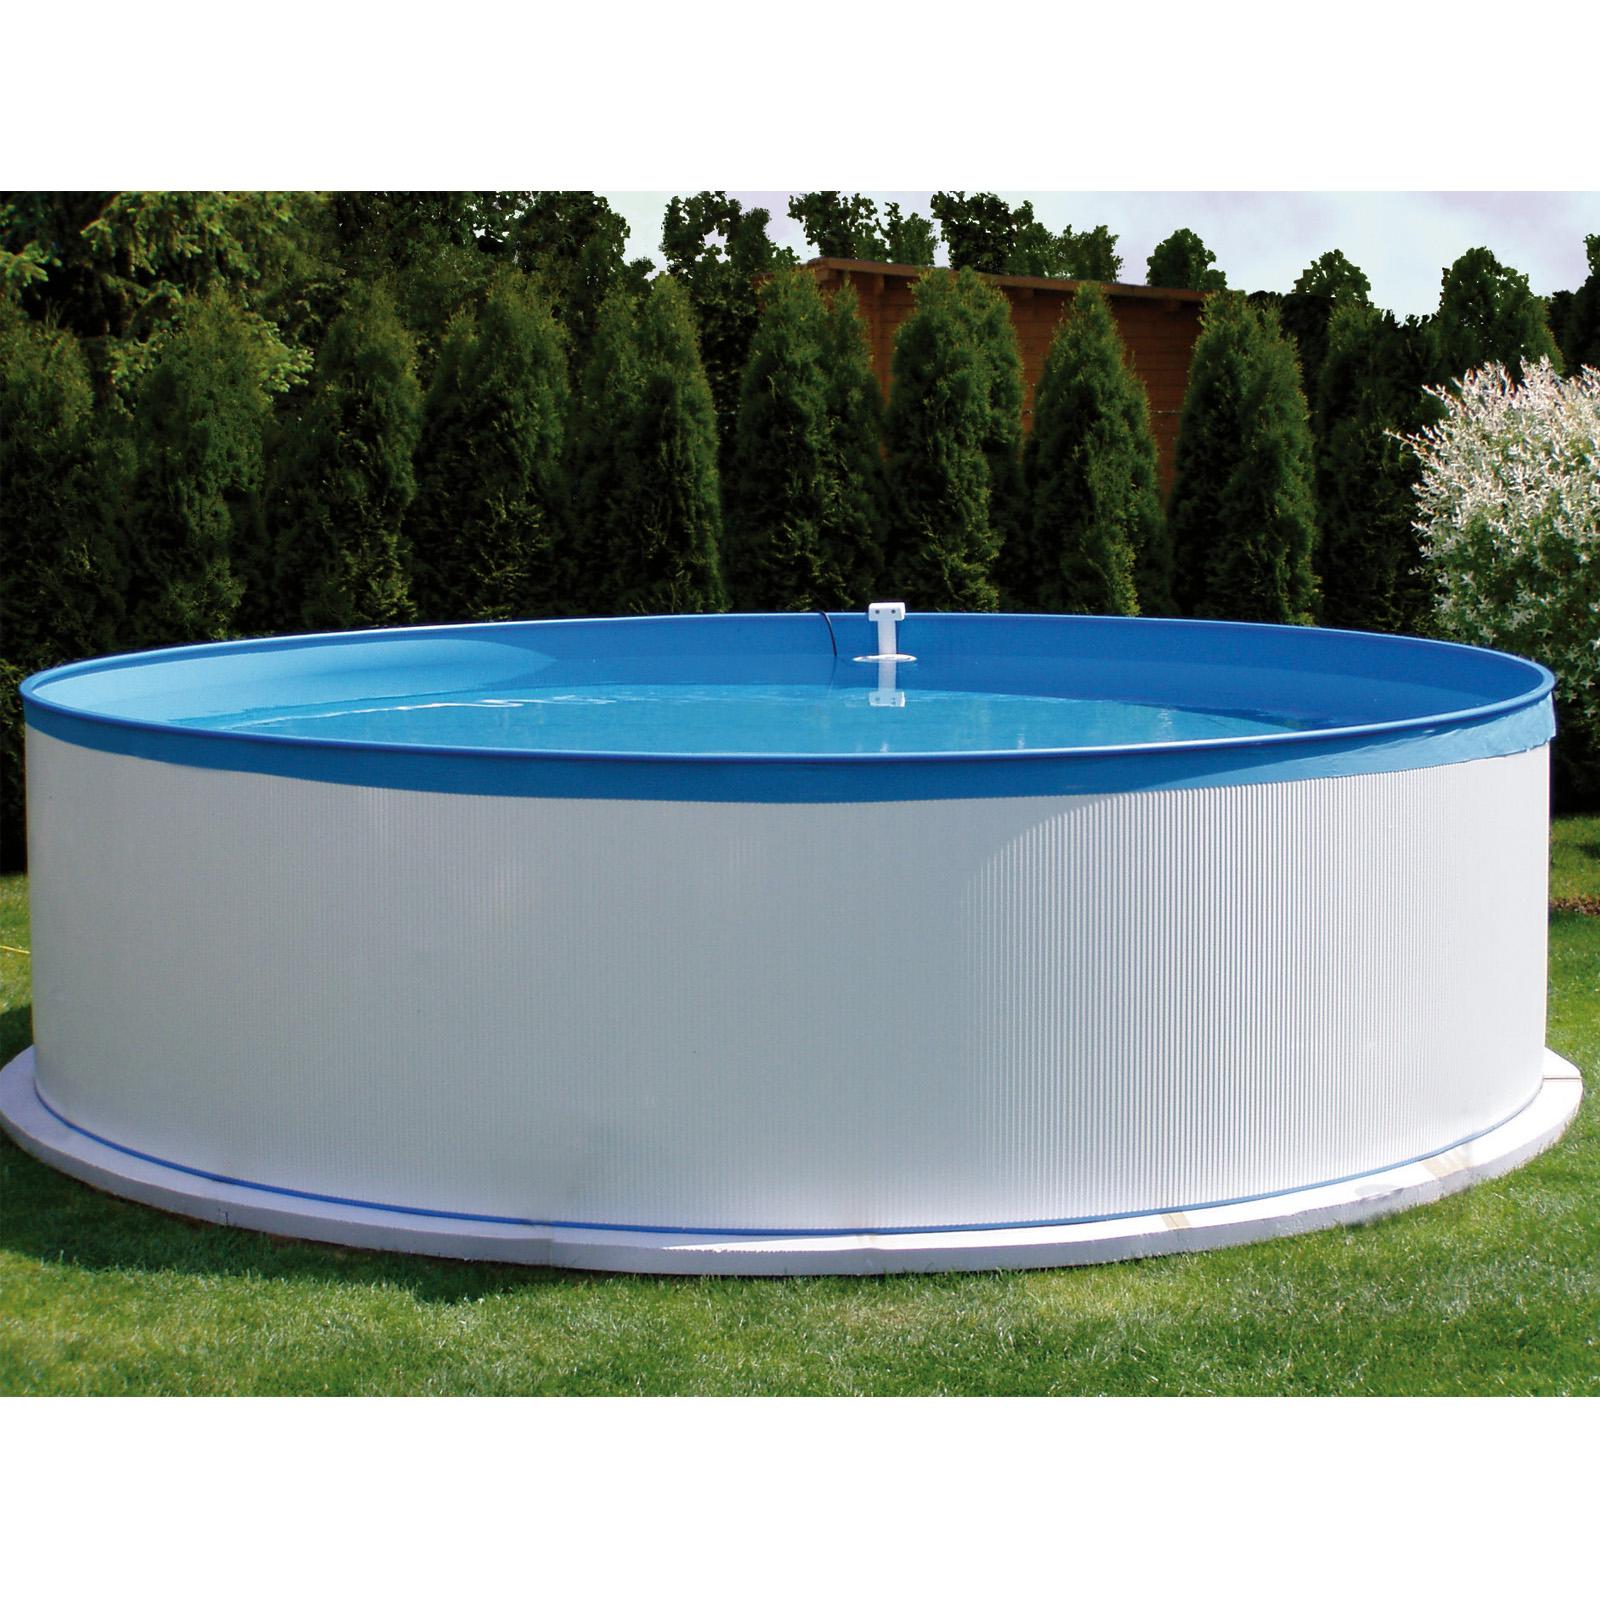 Stahlwandbecken Pool 350x90 11000 Splasher Pumpe Leiter Set Stahlwandpool